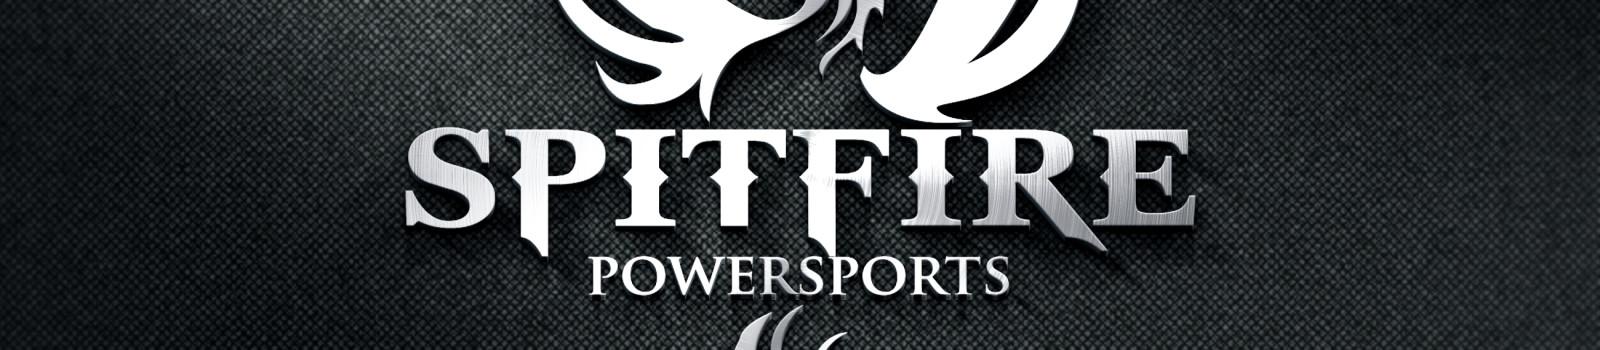 SpitfirePowerSports